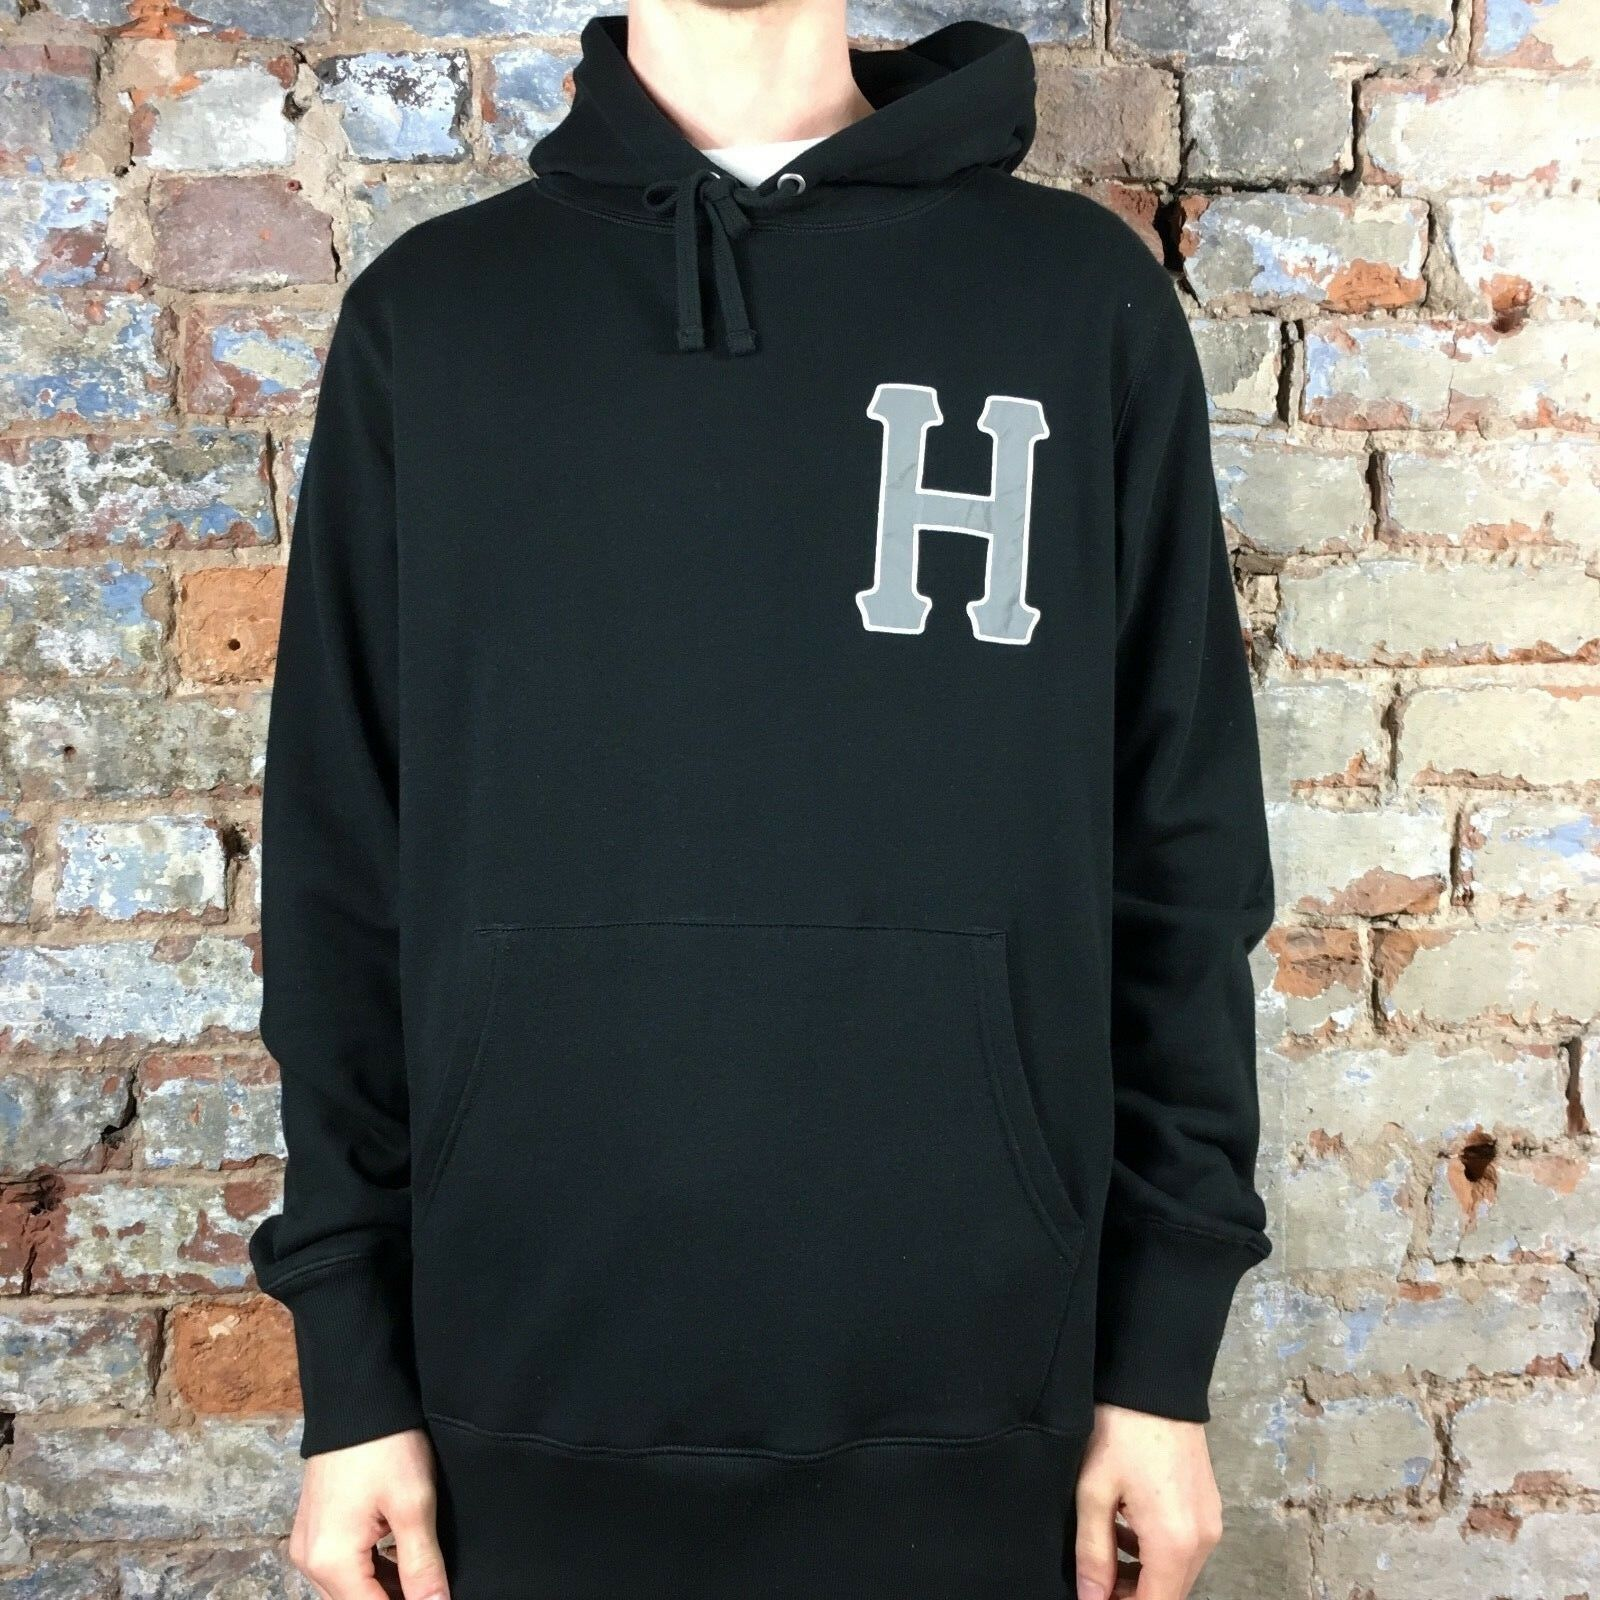 HUF Classic H 3M Applique Hoodie Pullover Hooded Sweatshirt In schwarz Größes S M L